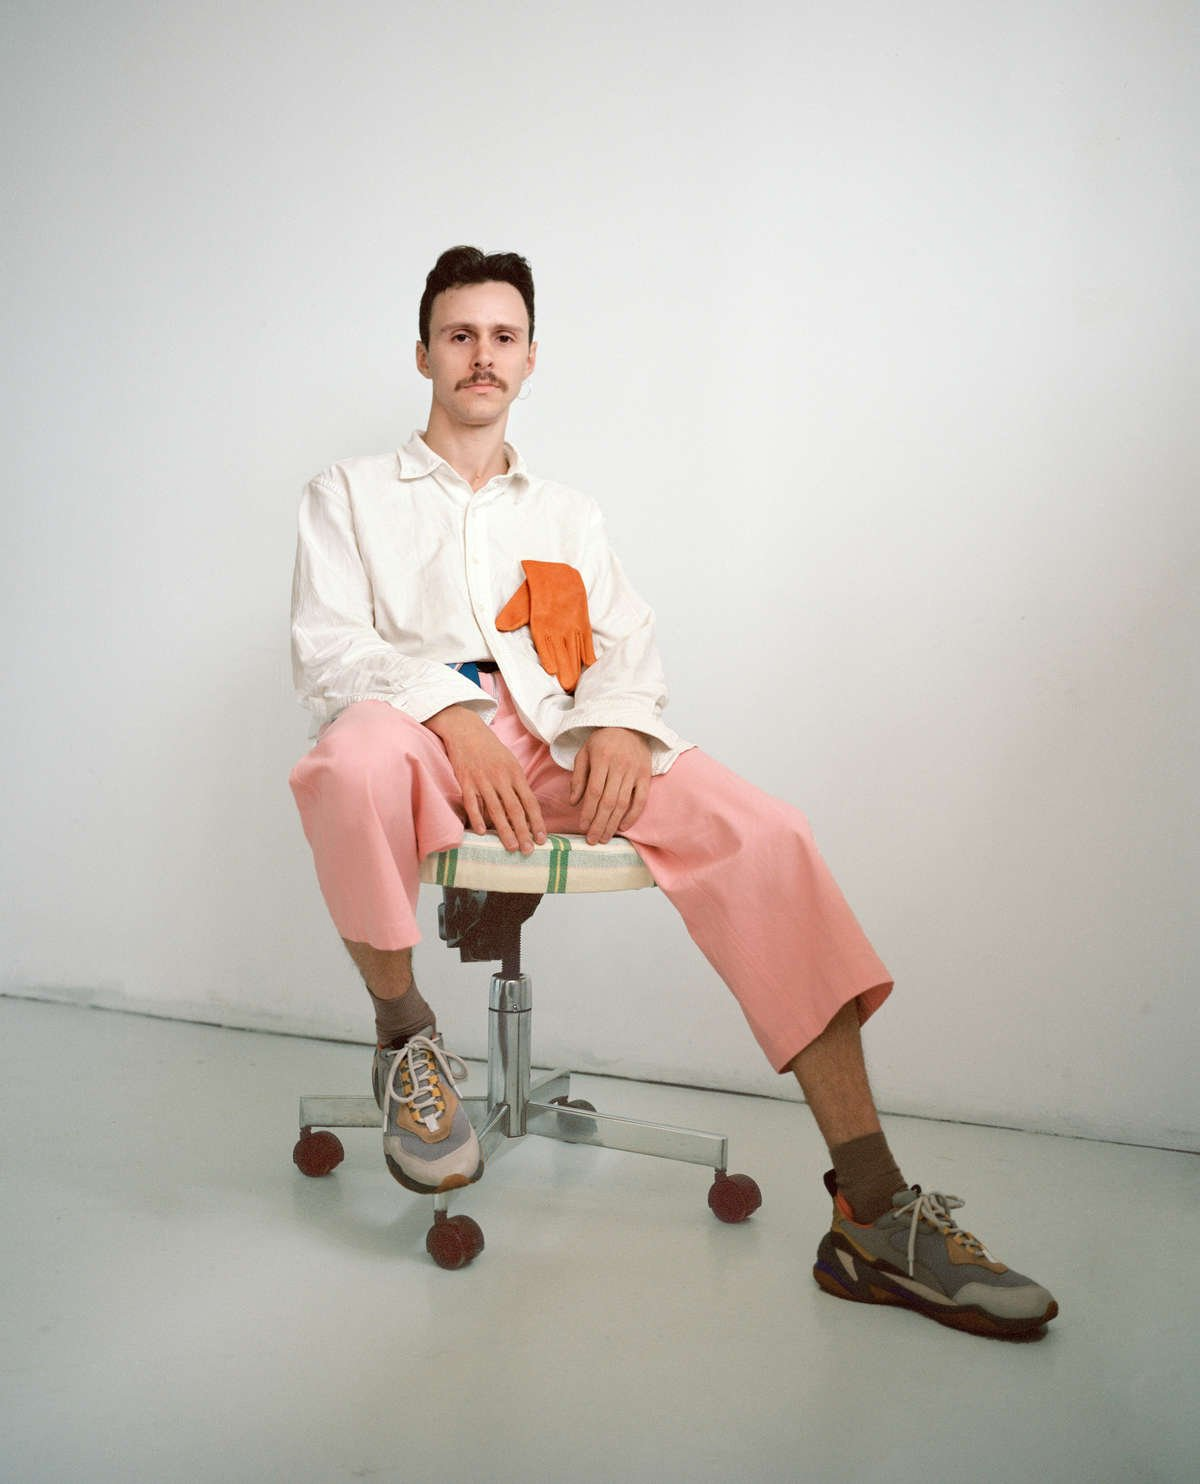 maggie jayne pink dungarees orgnaic cotton brandon brookbank hyle alden martens